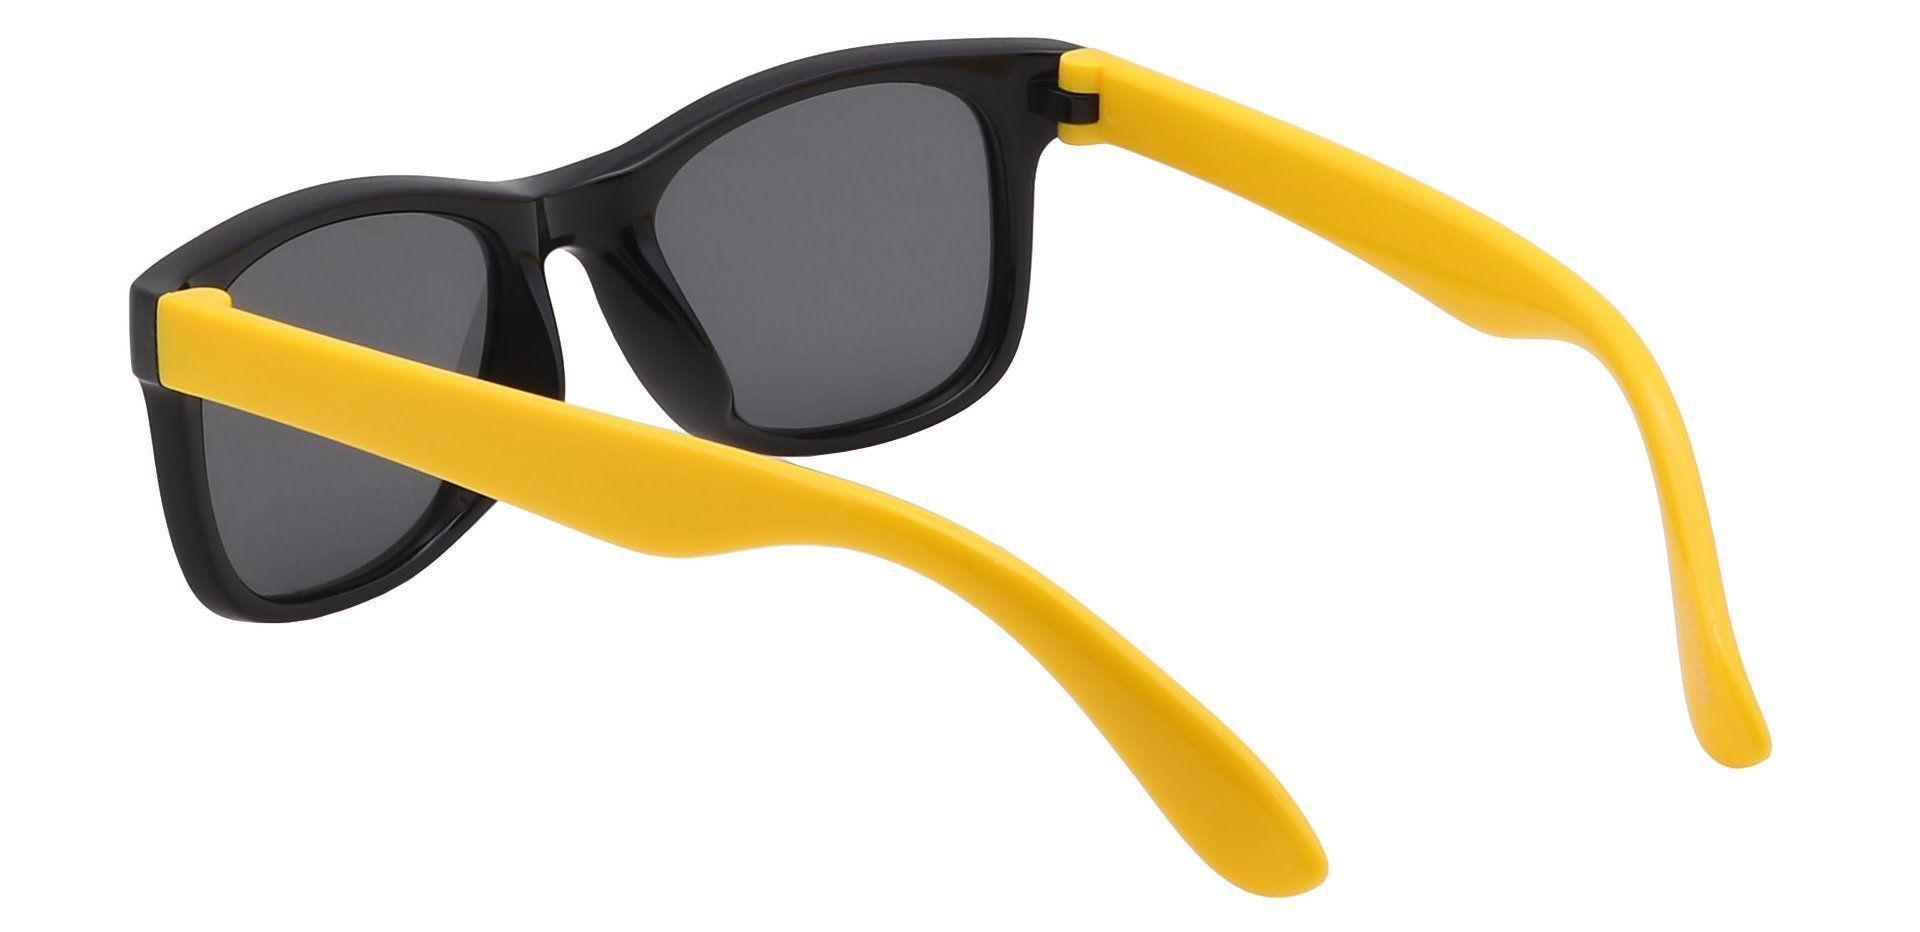 Benny Square Single Vision Sunglasses - Black Frame With Gray Lenses